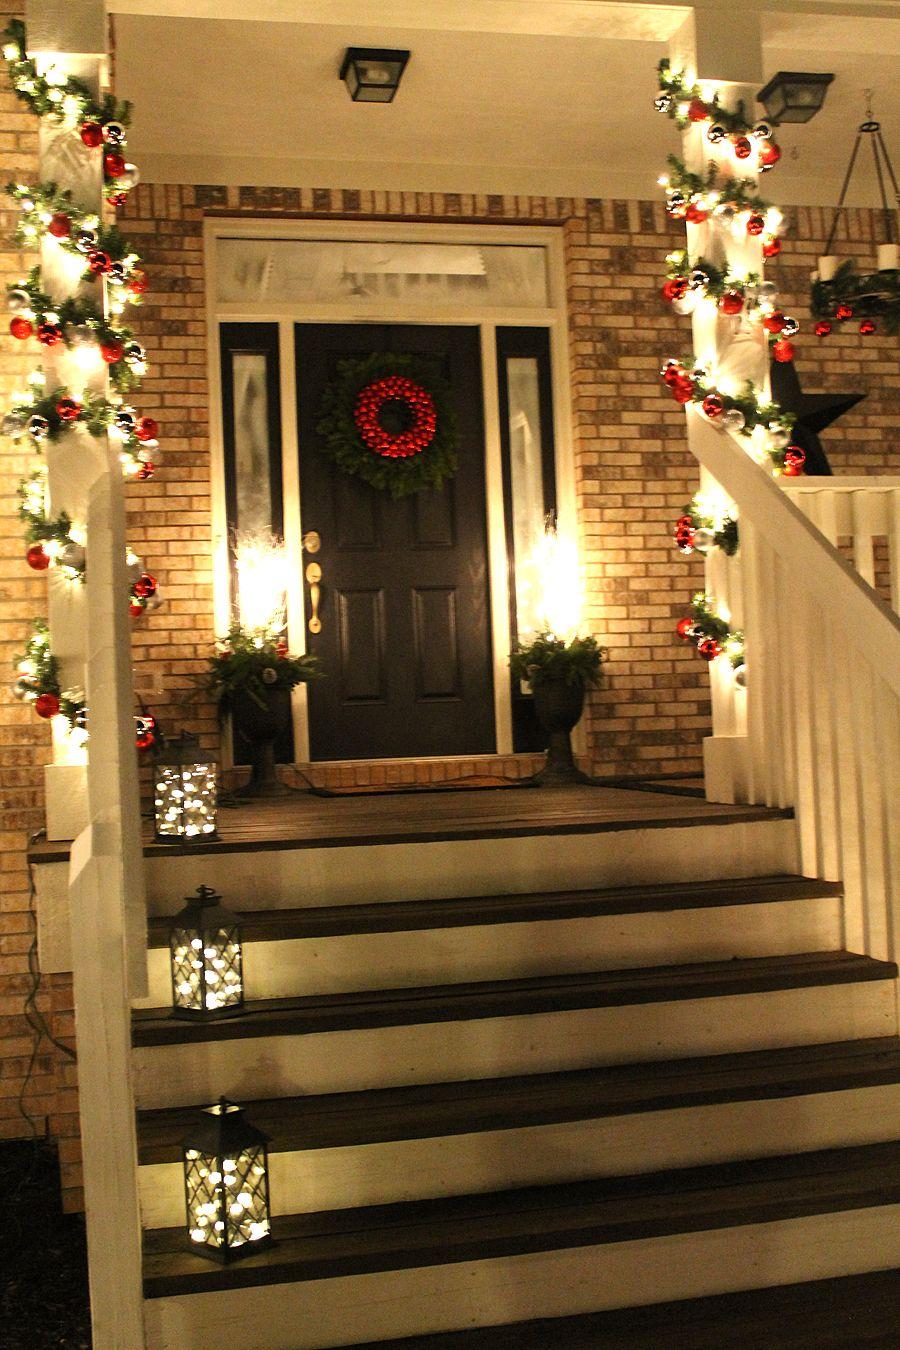 21 Christmas Porch Decoration Ideas Best Of Diy Ideas Christmas Porch Decor Christmas Lights Holiday Decor